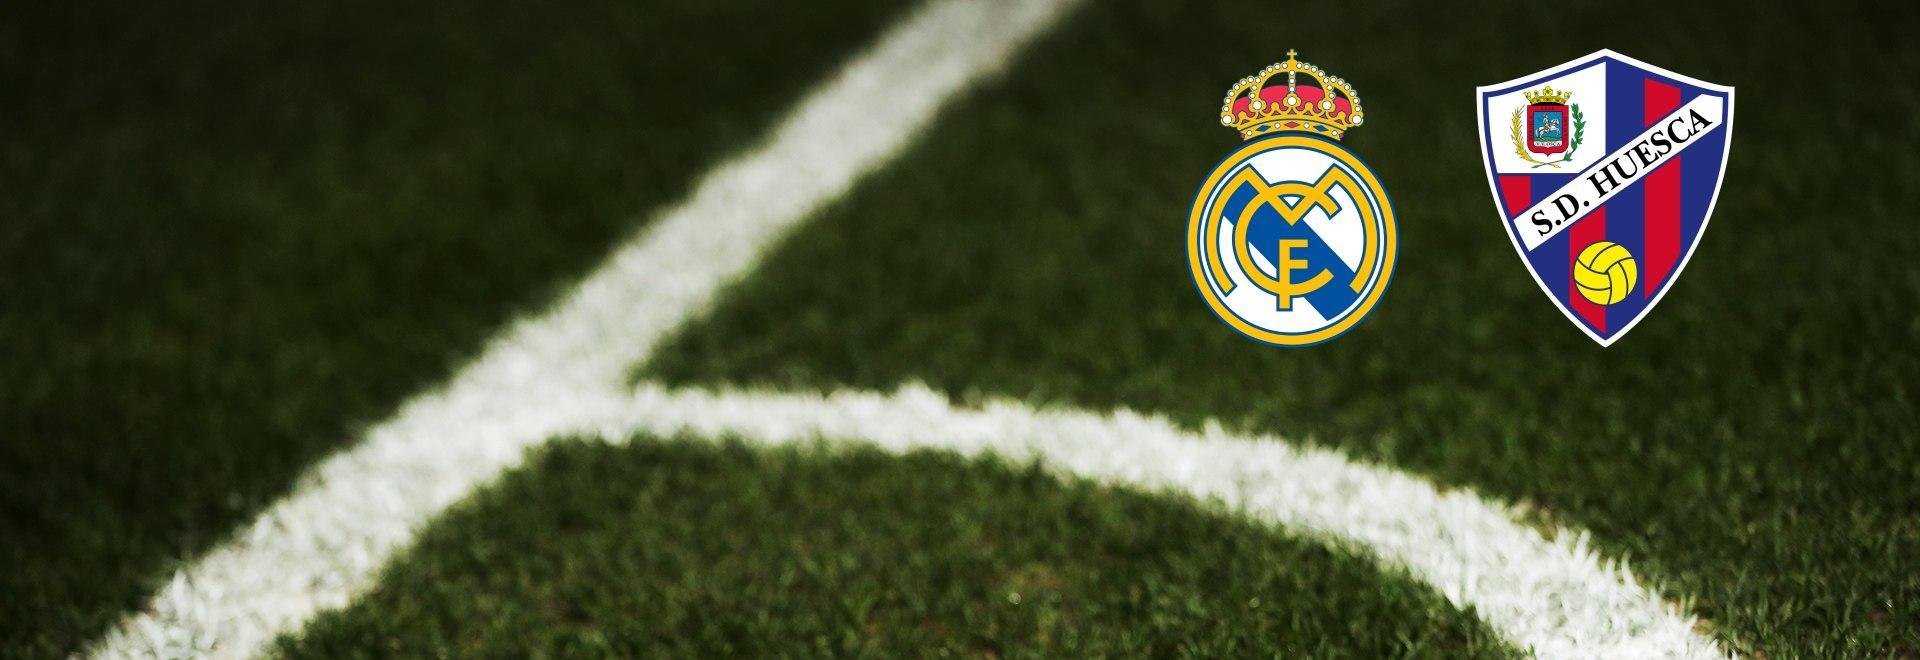 Real Madrid - Huesca. 8a g.